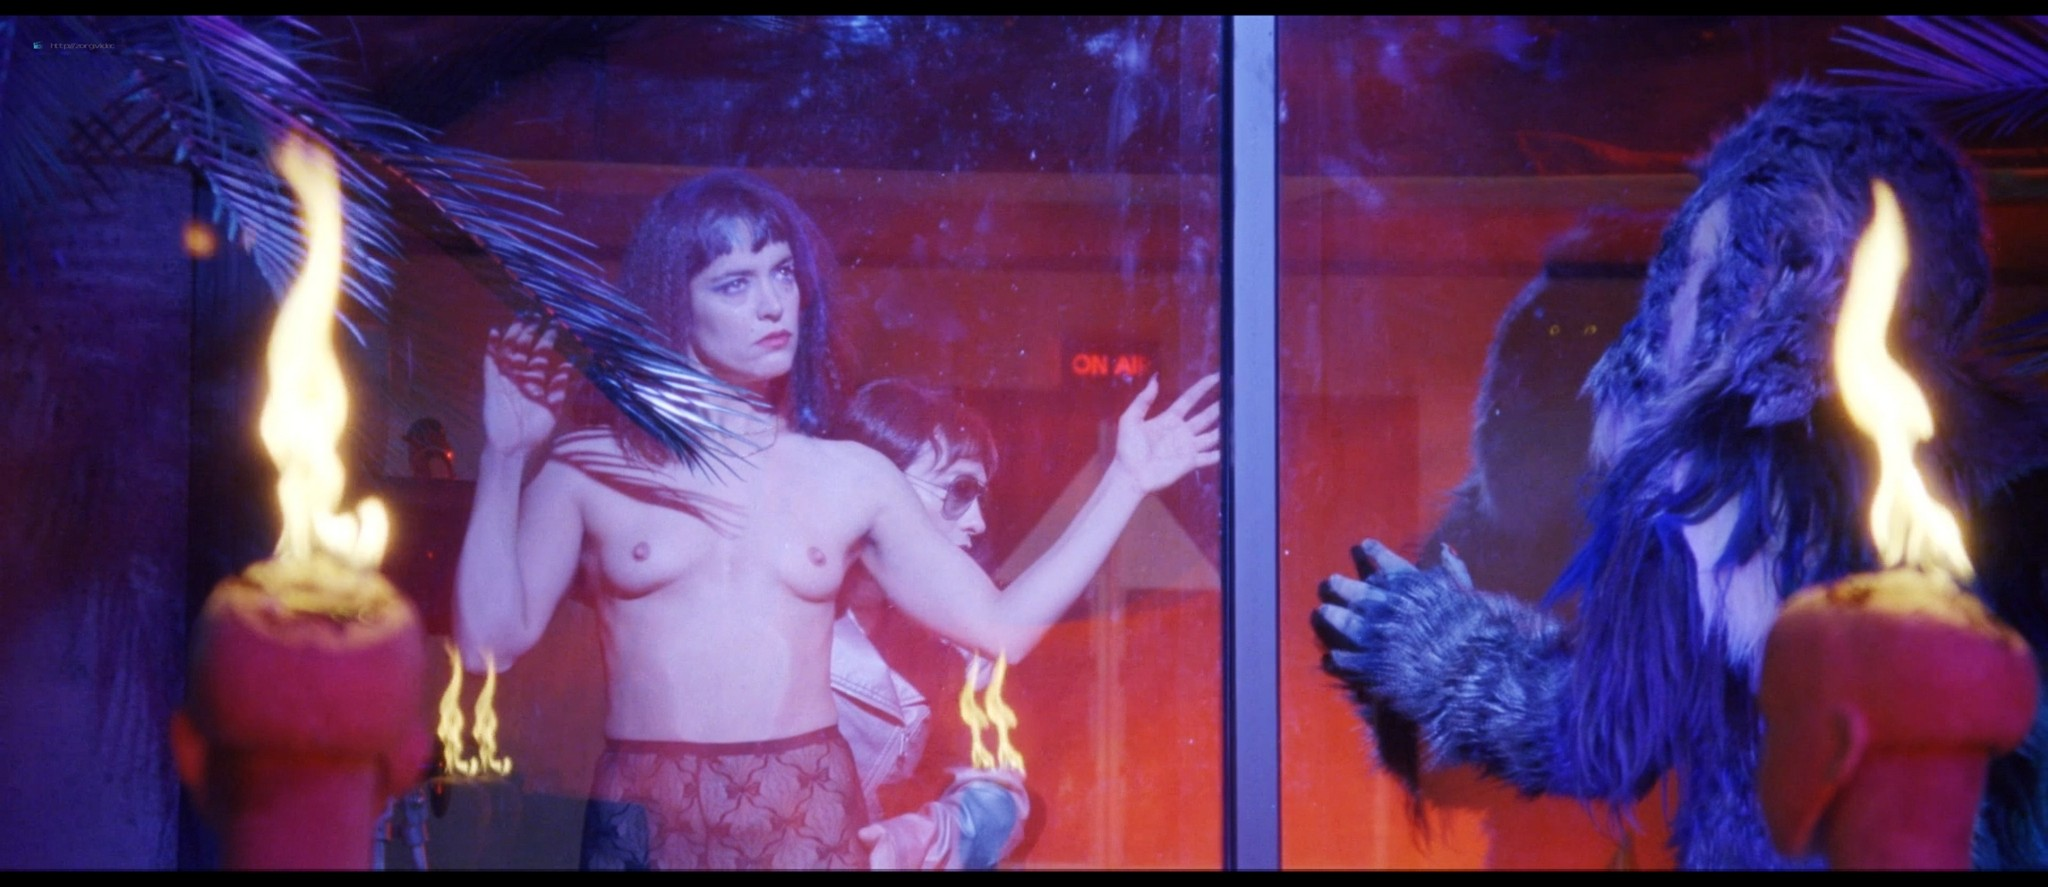 Vimala Pons nude Pauline Jacquard, Lola Créton asnd other nude too - Ultra pulpe (2018) HD 1080p Web (11)